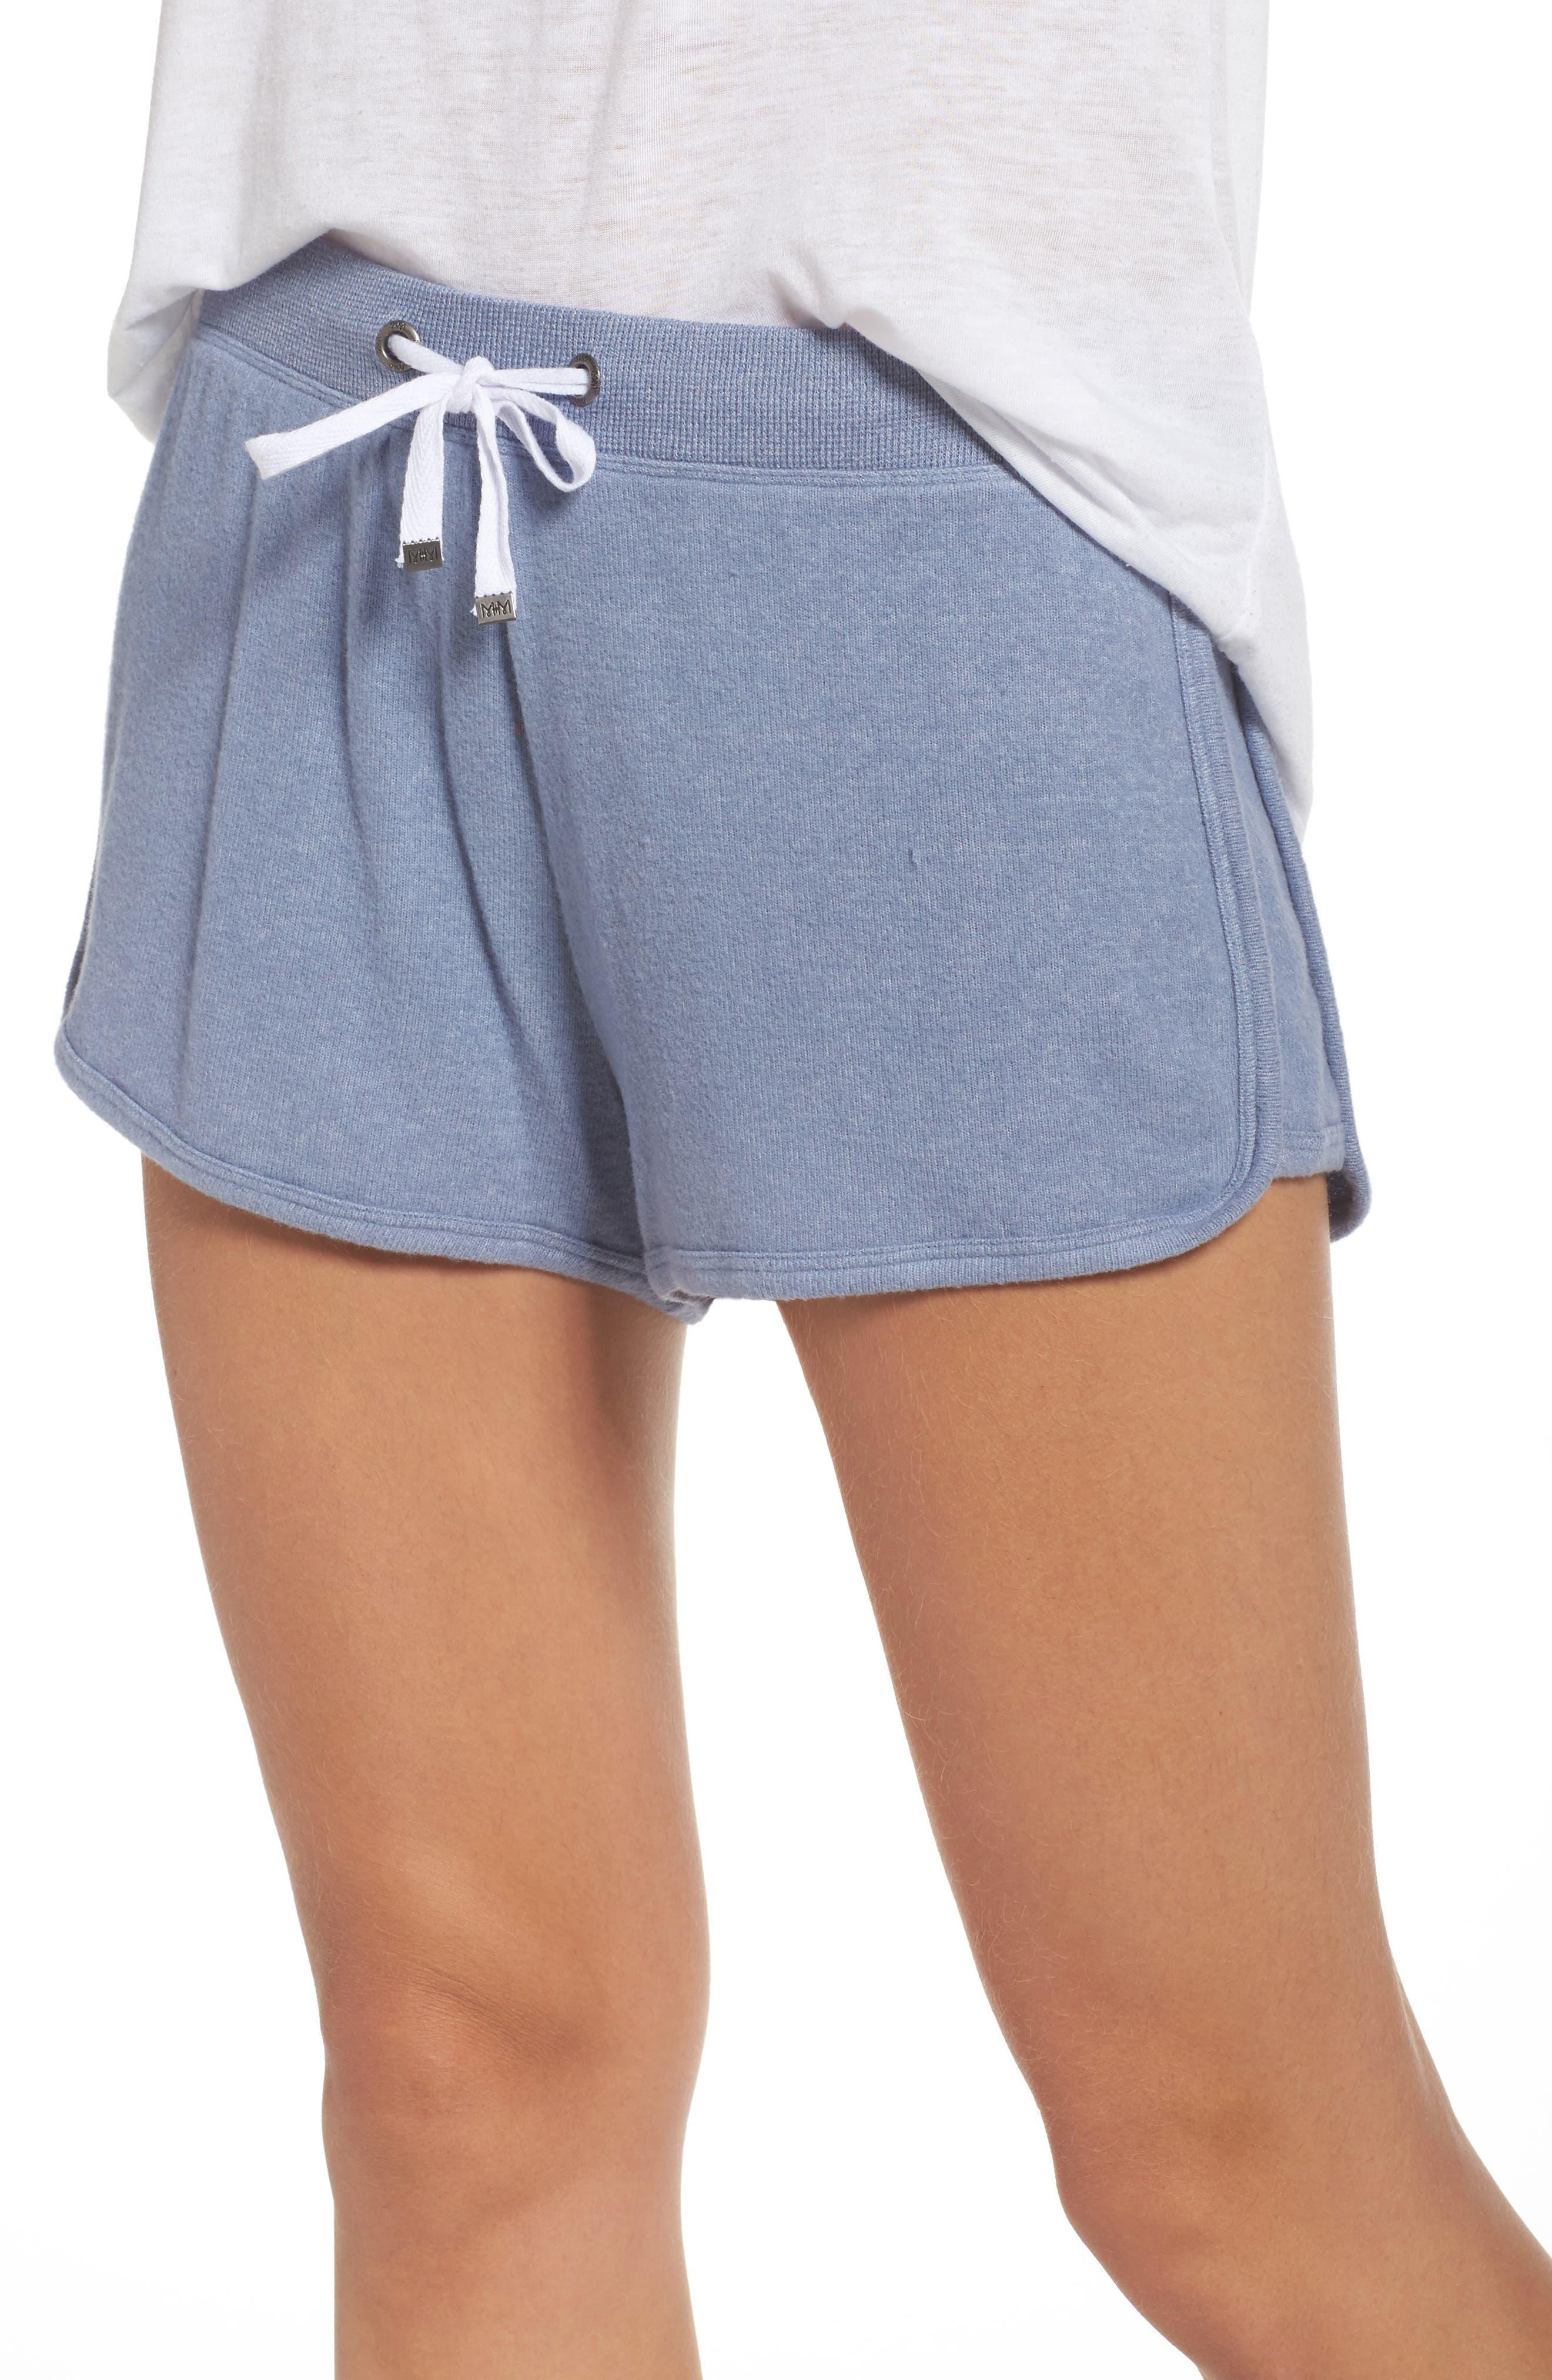 Make + Model Bring It On Lounge Shorts